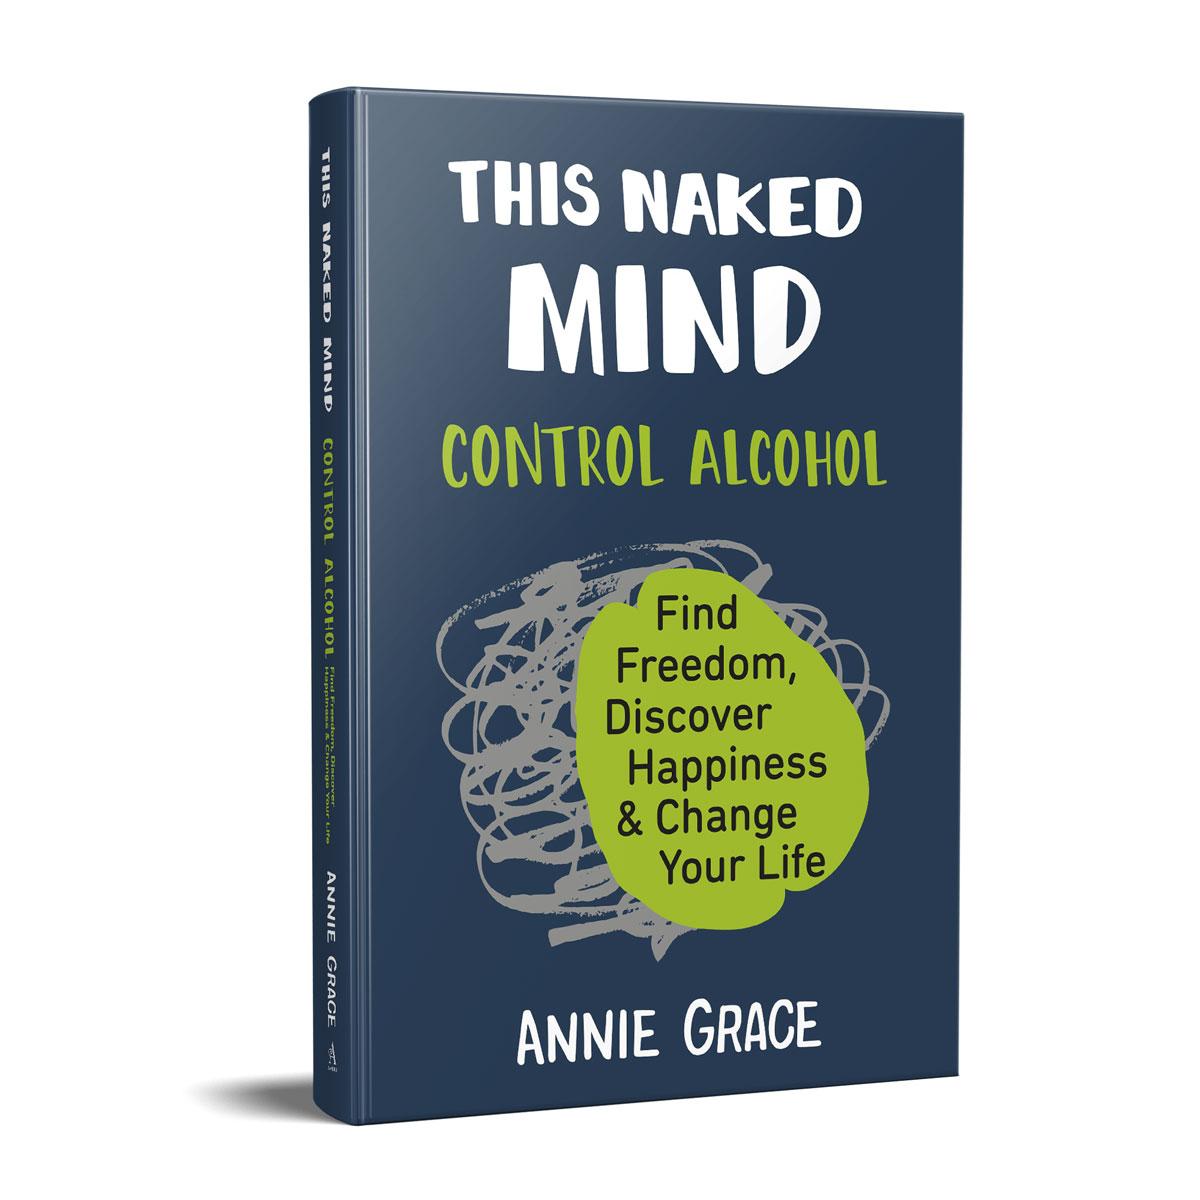 TNM-Control-Alcohol_Book_right_jan-18-2018.jpg